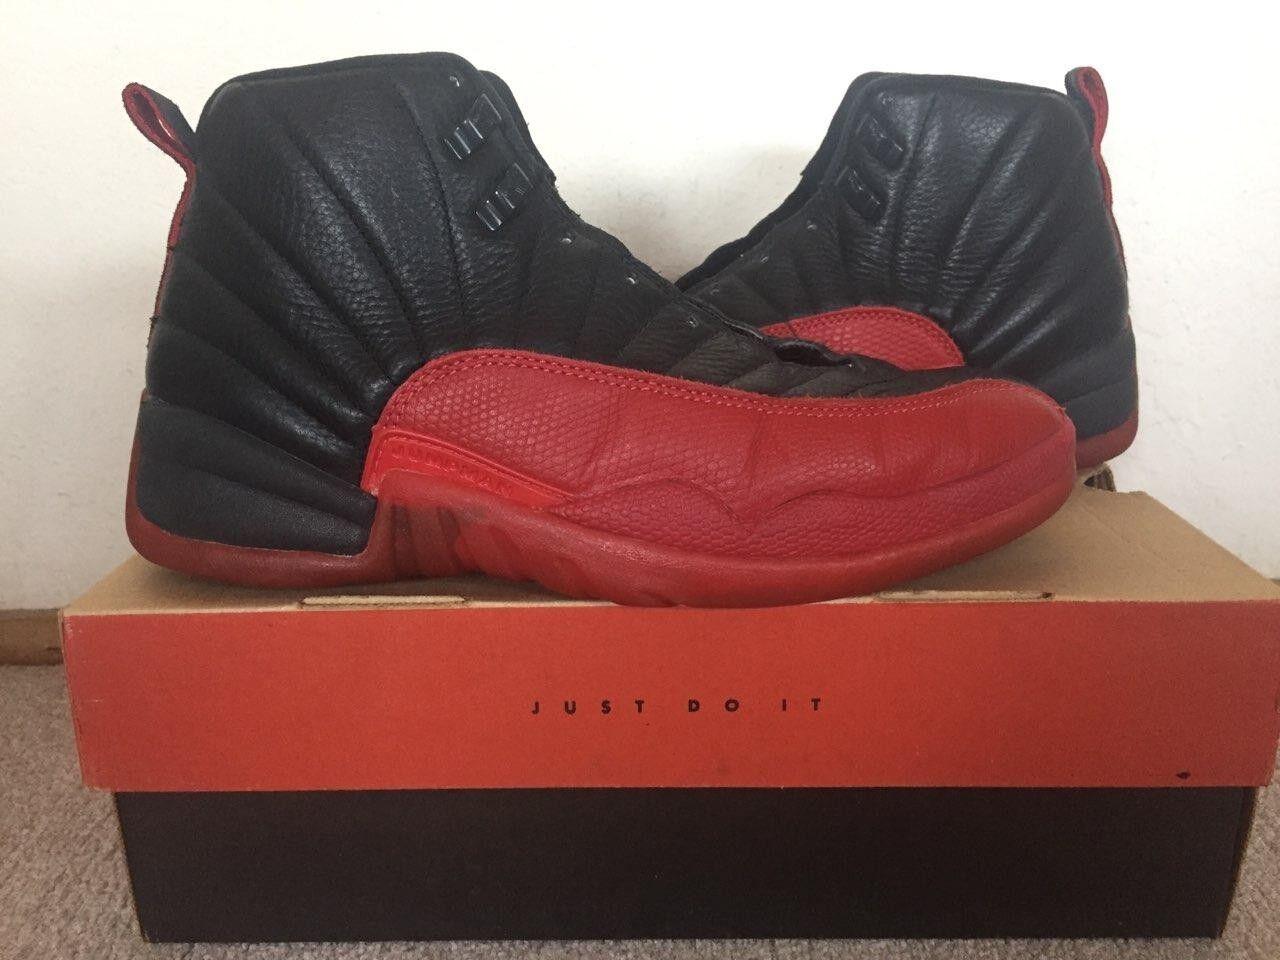 Jordan 12 Flu Game OG Size 10.5